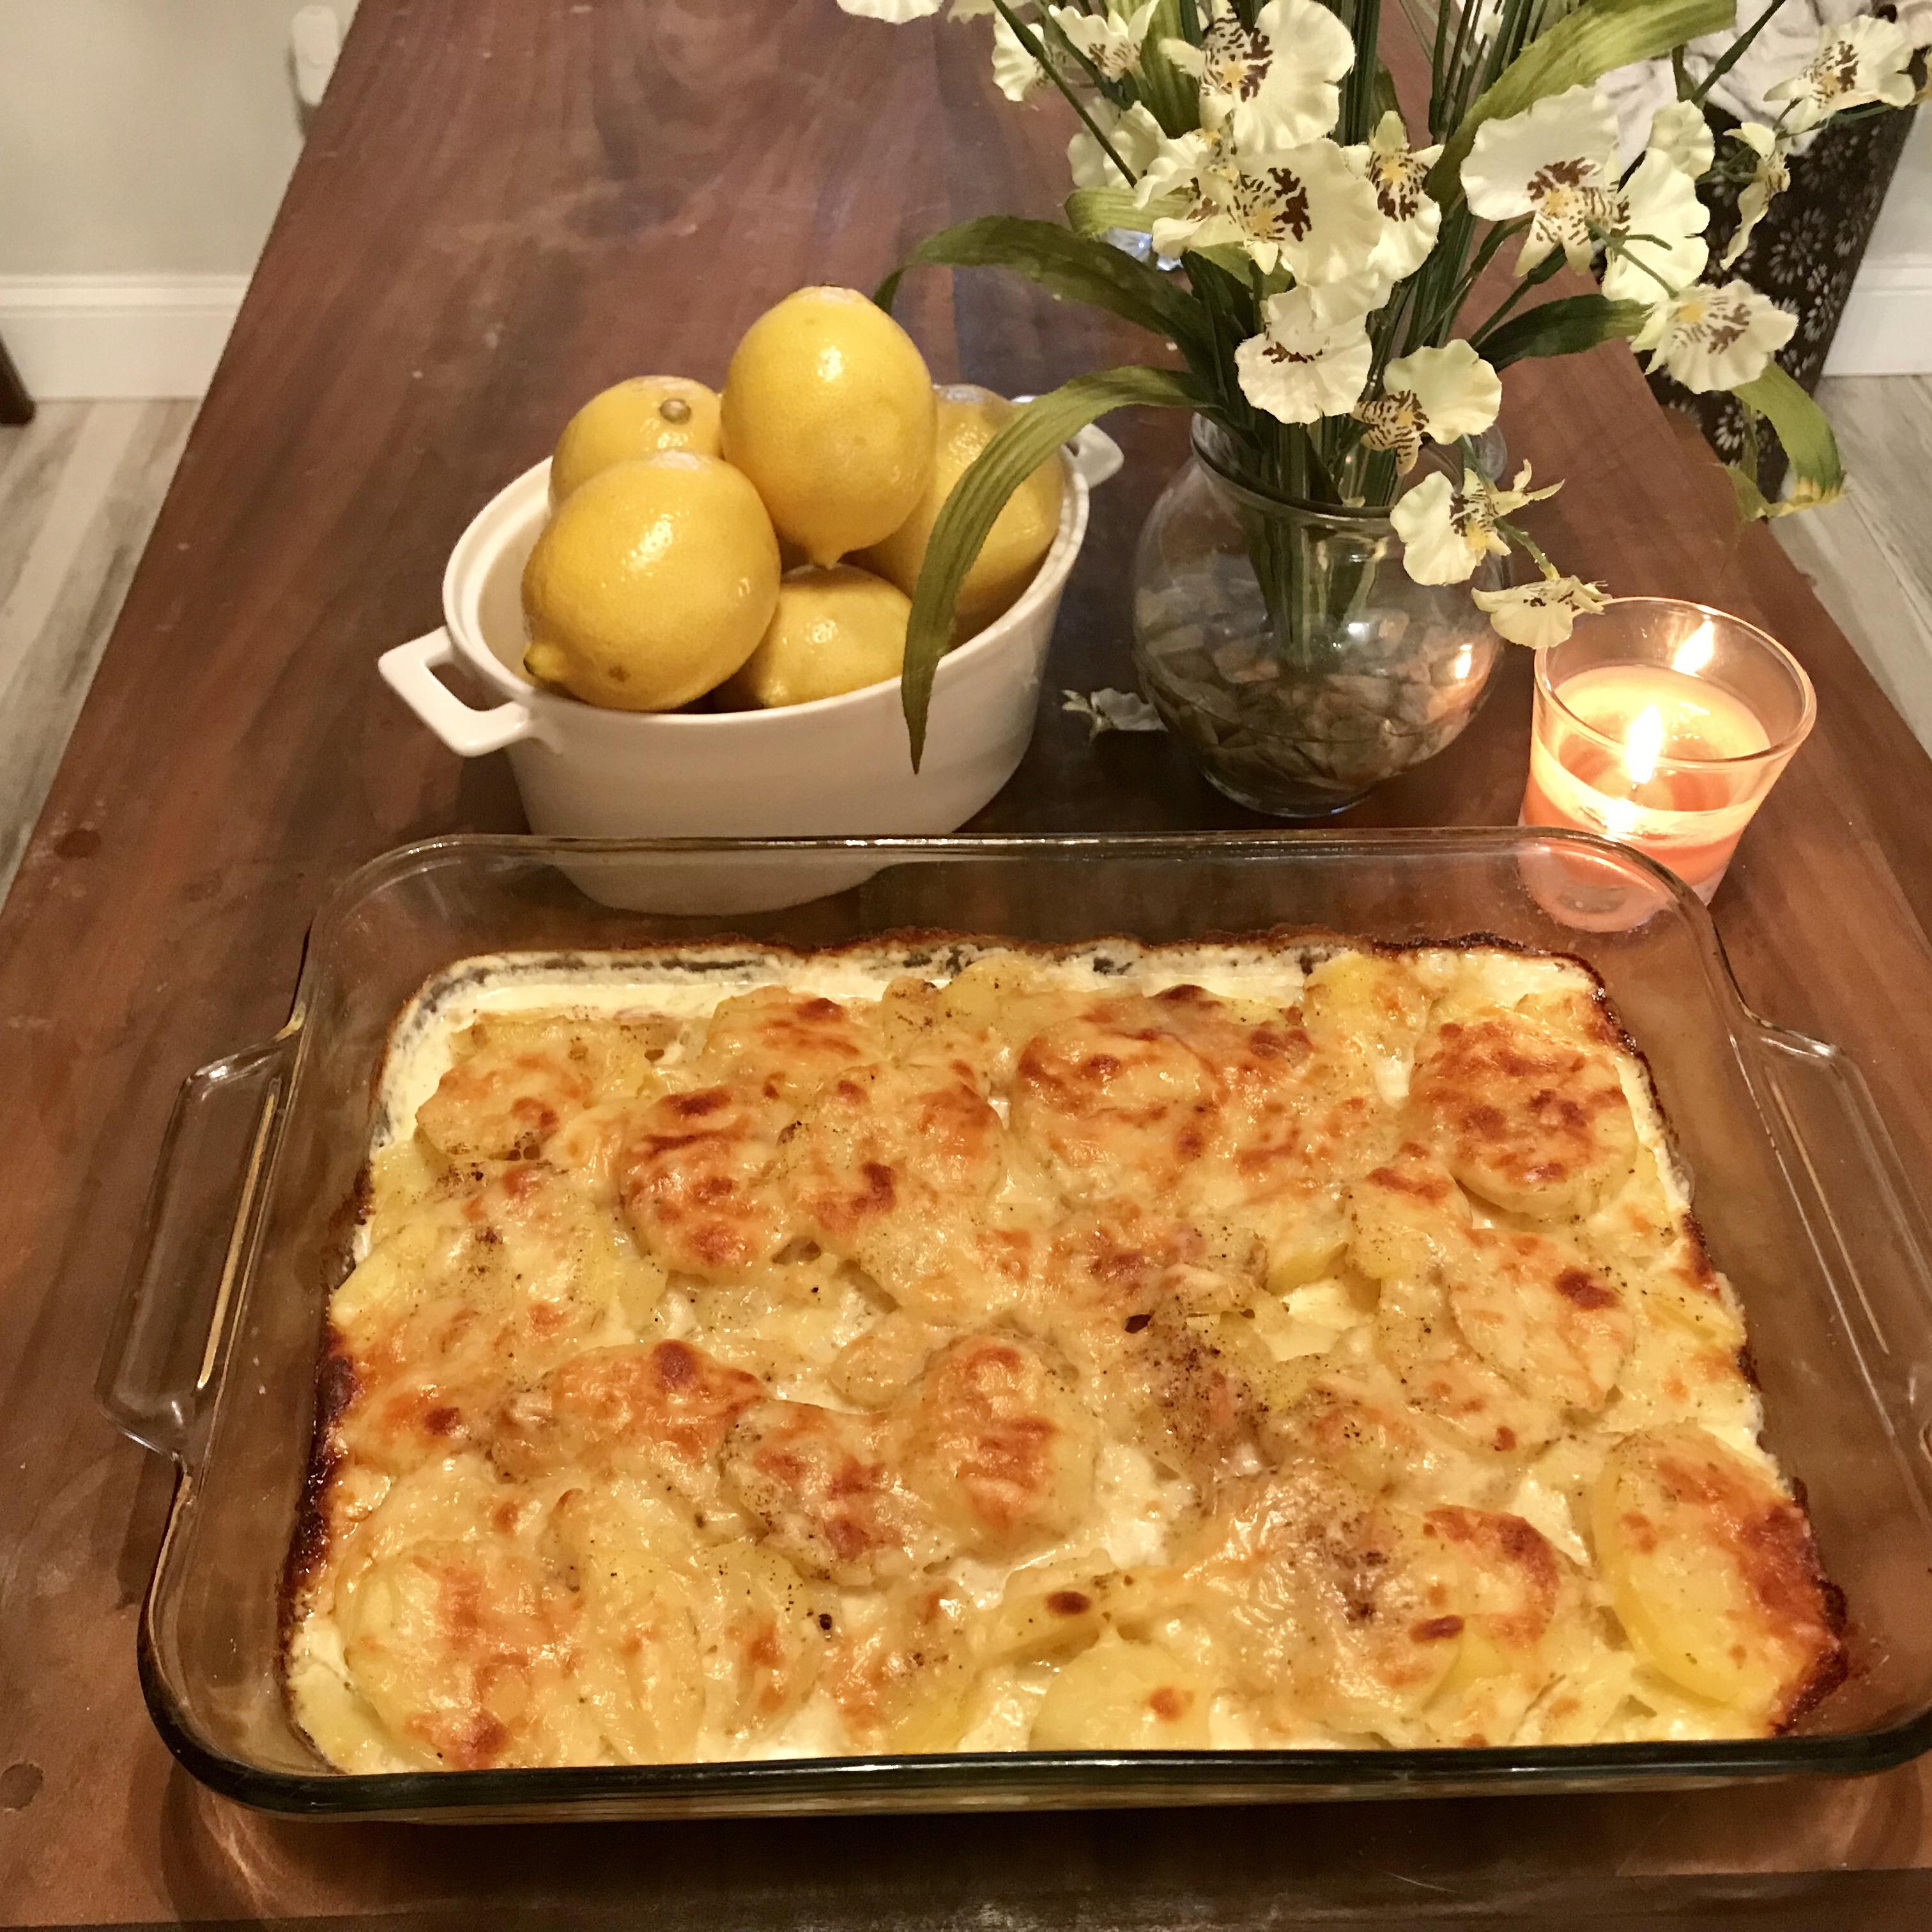 Rich and Creamy Potatoes Au Gratin